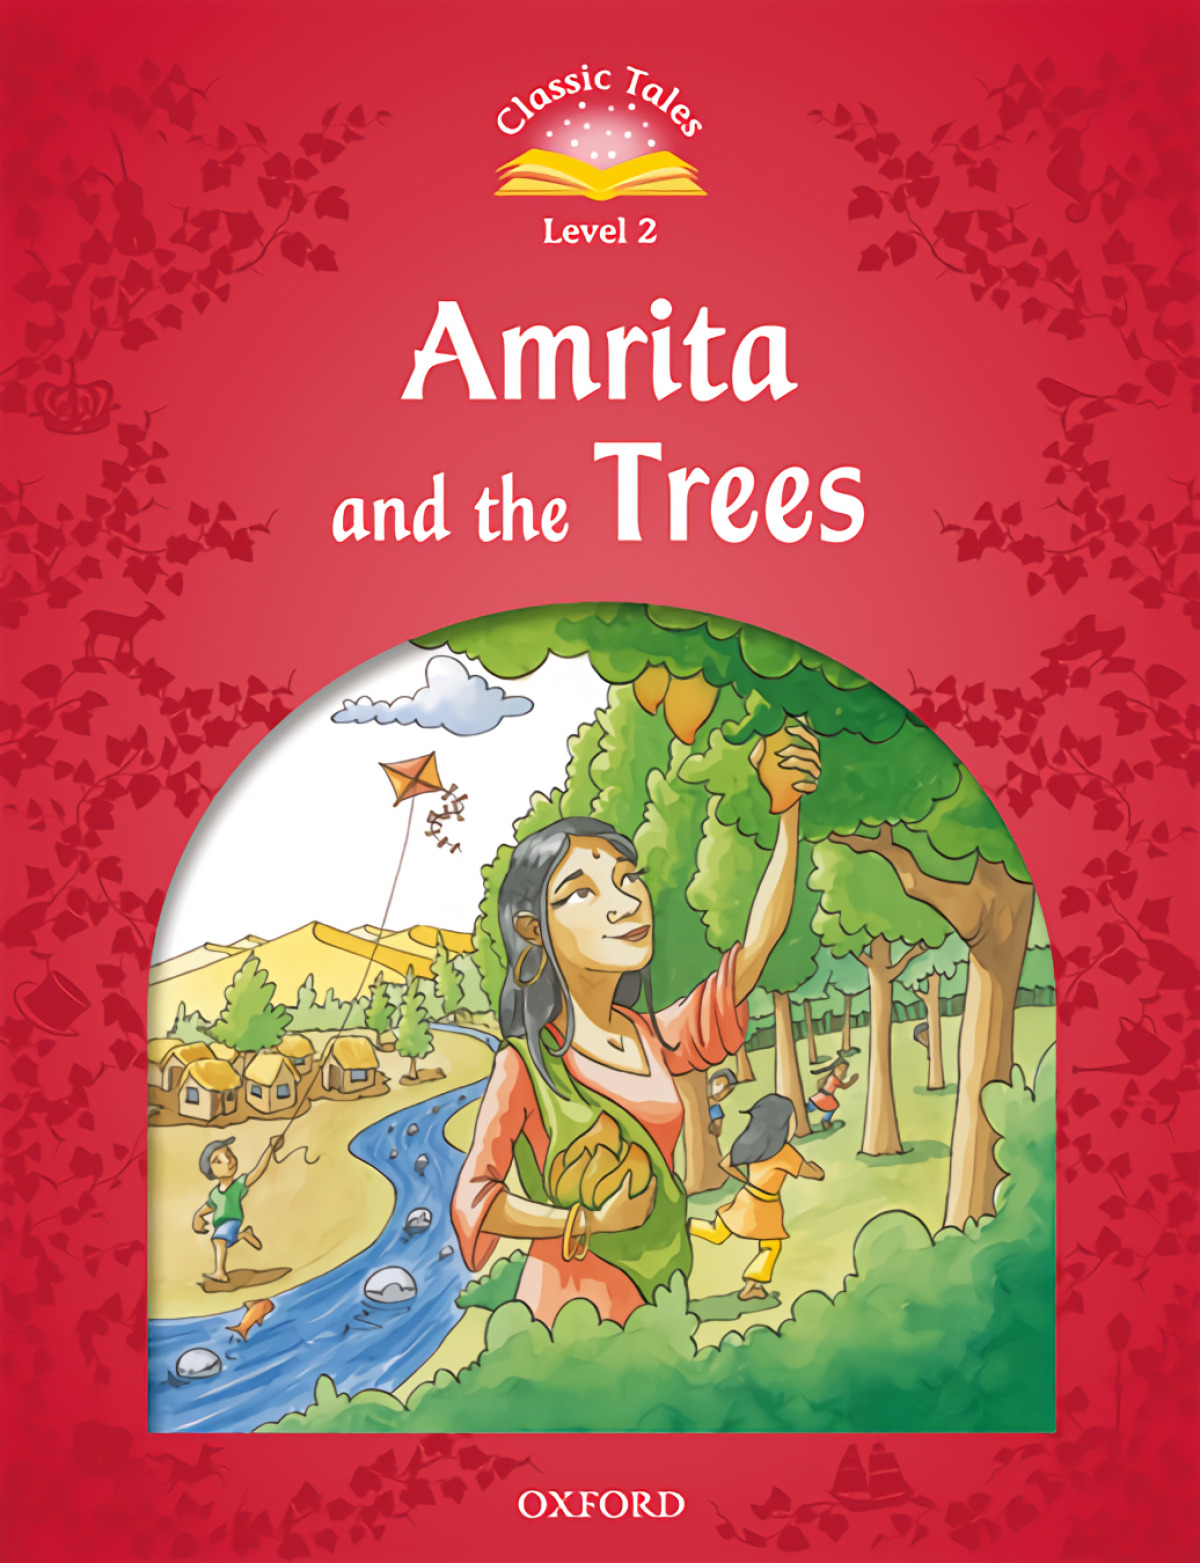 amrita & the trees.(2 classic tales)